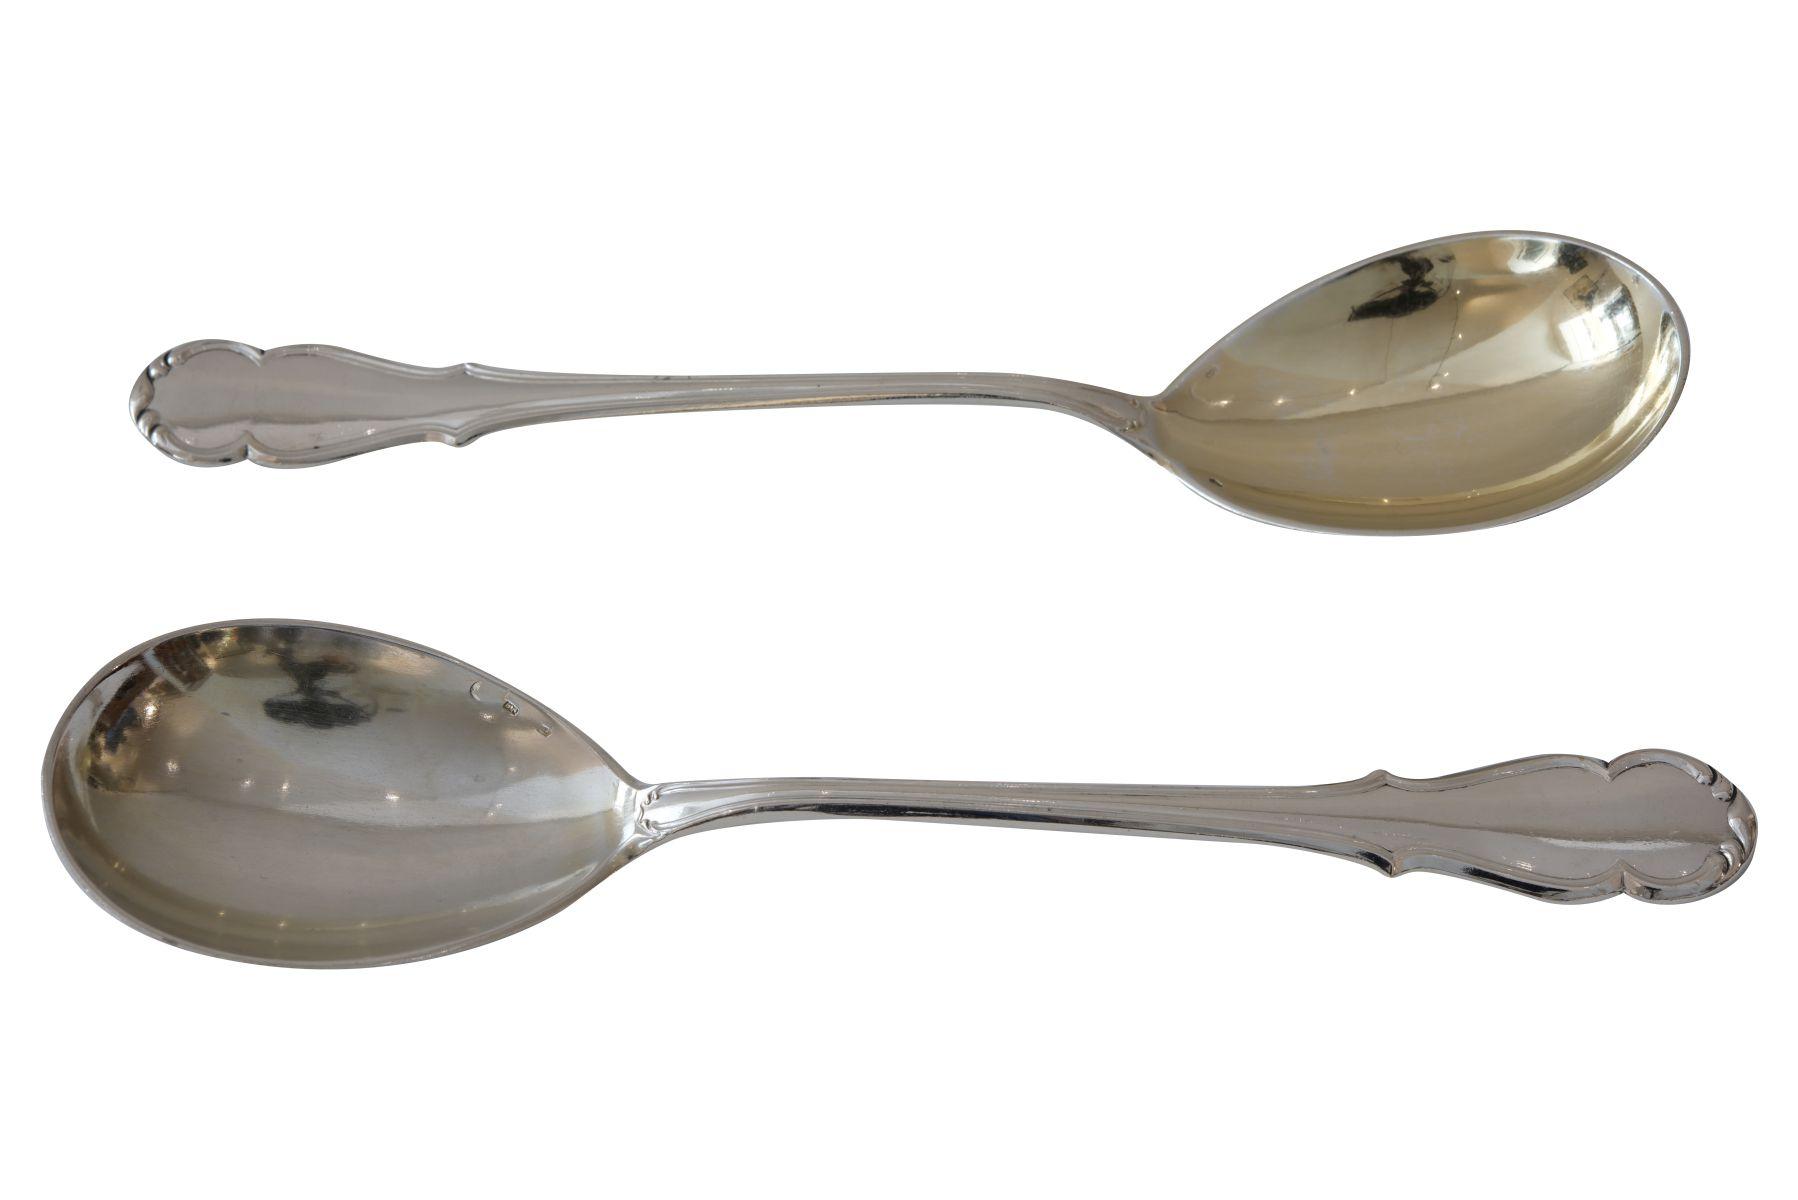 #45 Sauce spoons | Zwei Saucenlöffel Silber Image